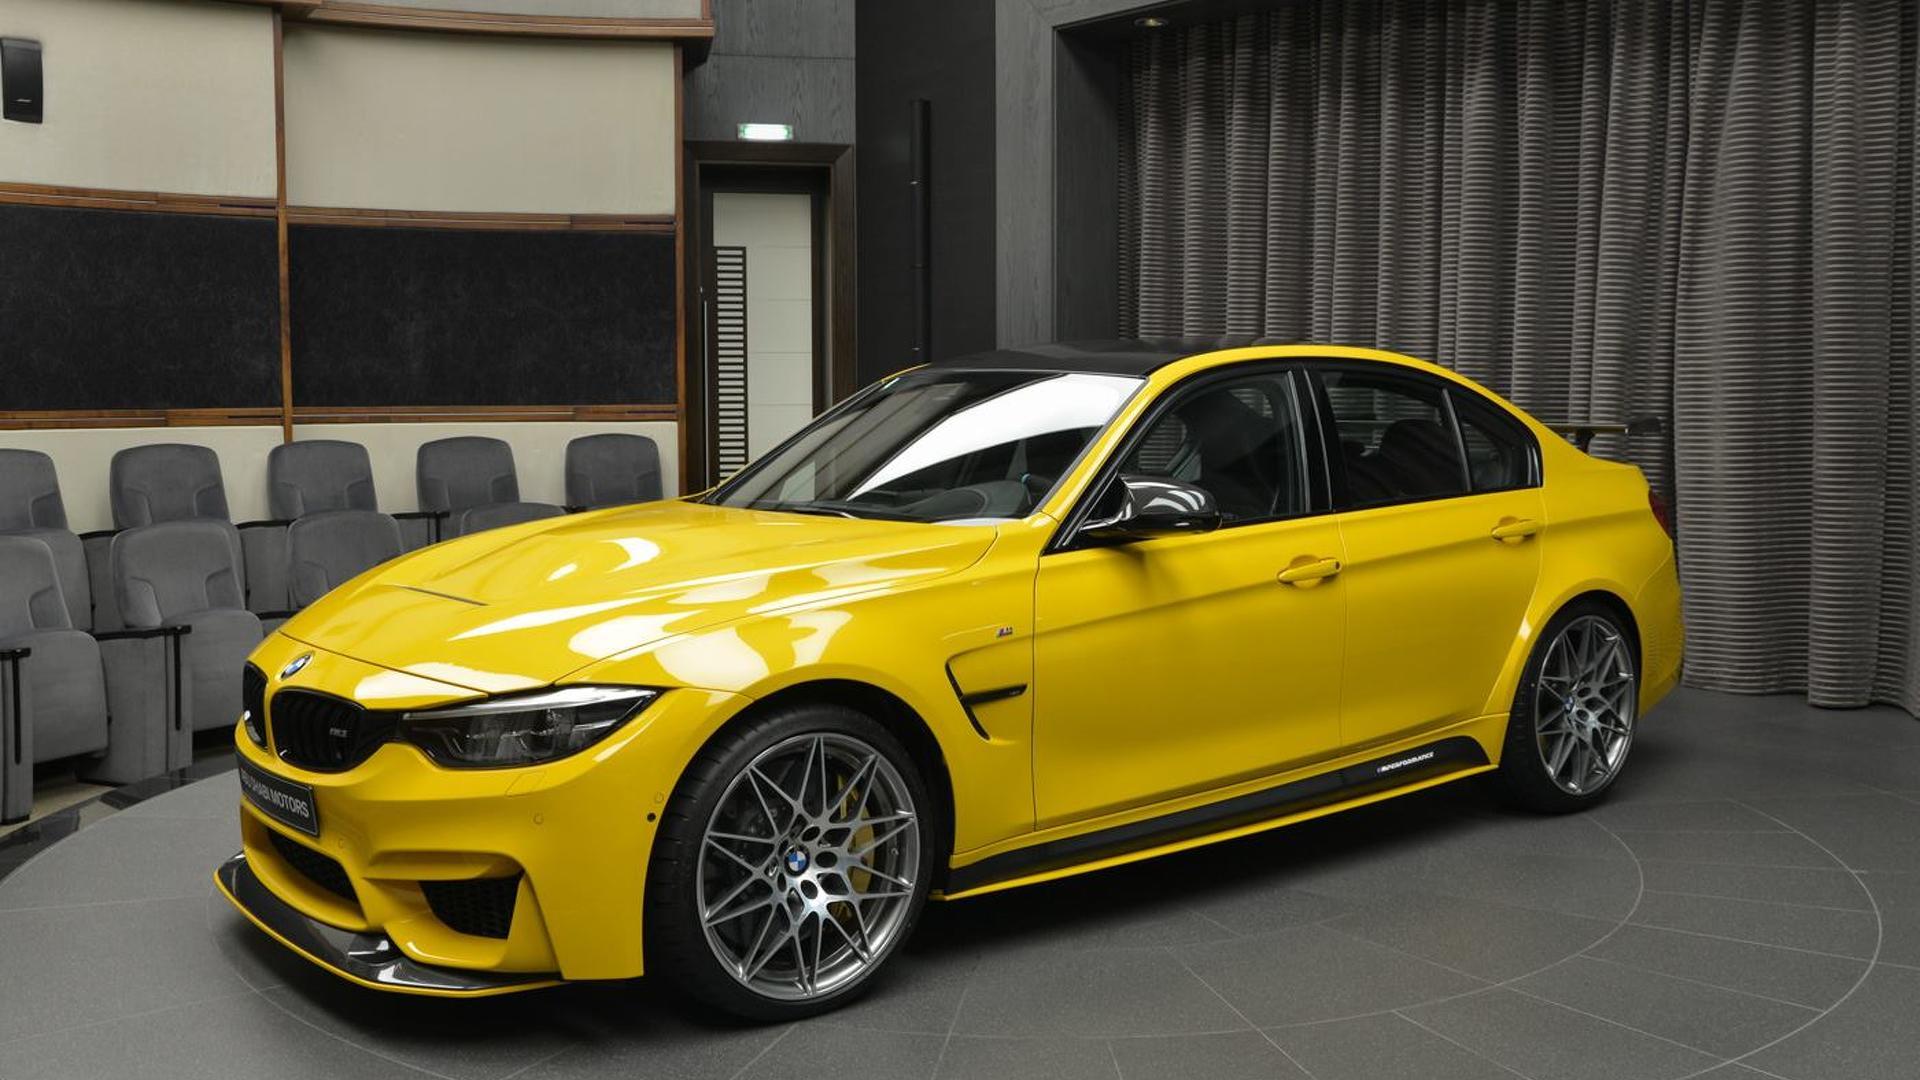 2017 BMW M3 Speed Yellow